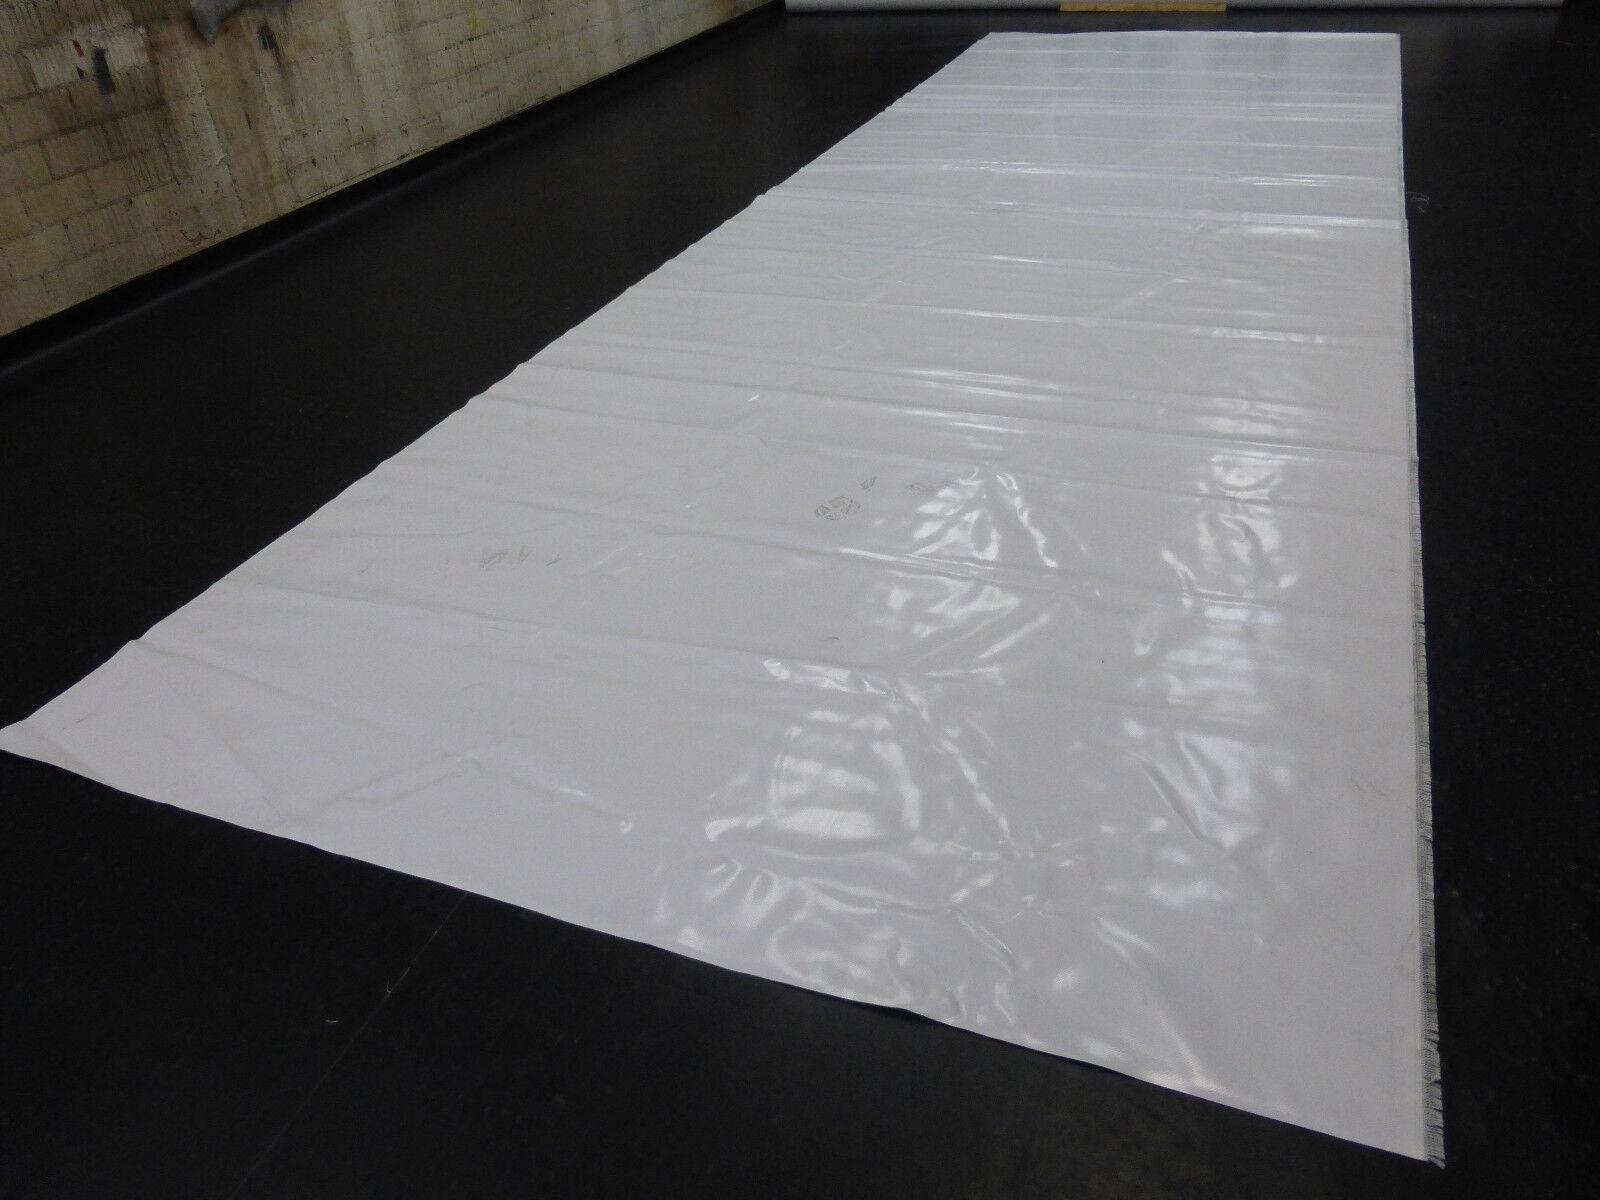 3,9€/m² PVC Folie Abdeckplane LKW Plane 7,25m x 2,40m ca. 1400g/qm weiß B-Ware